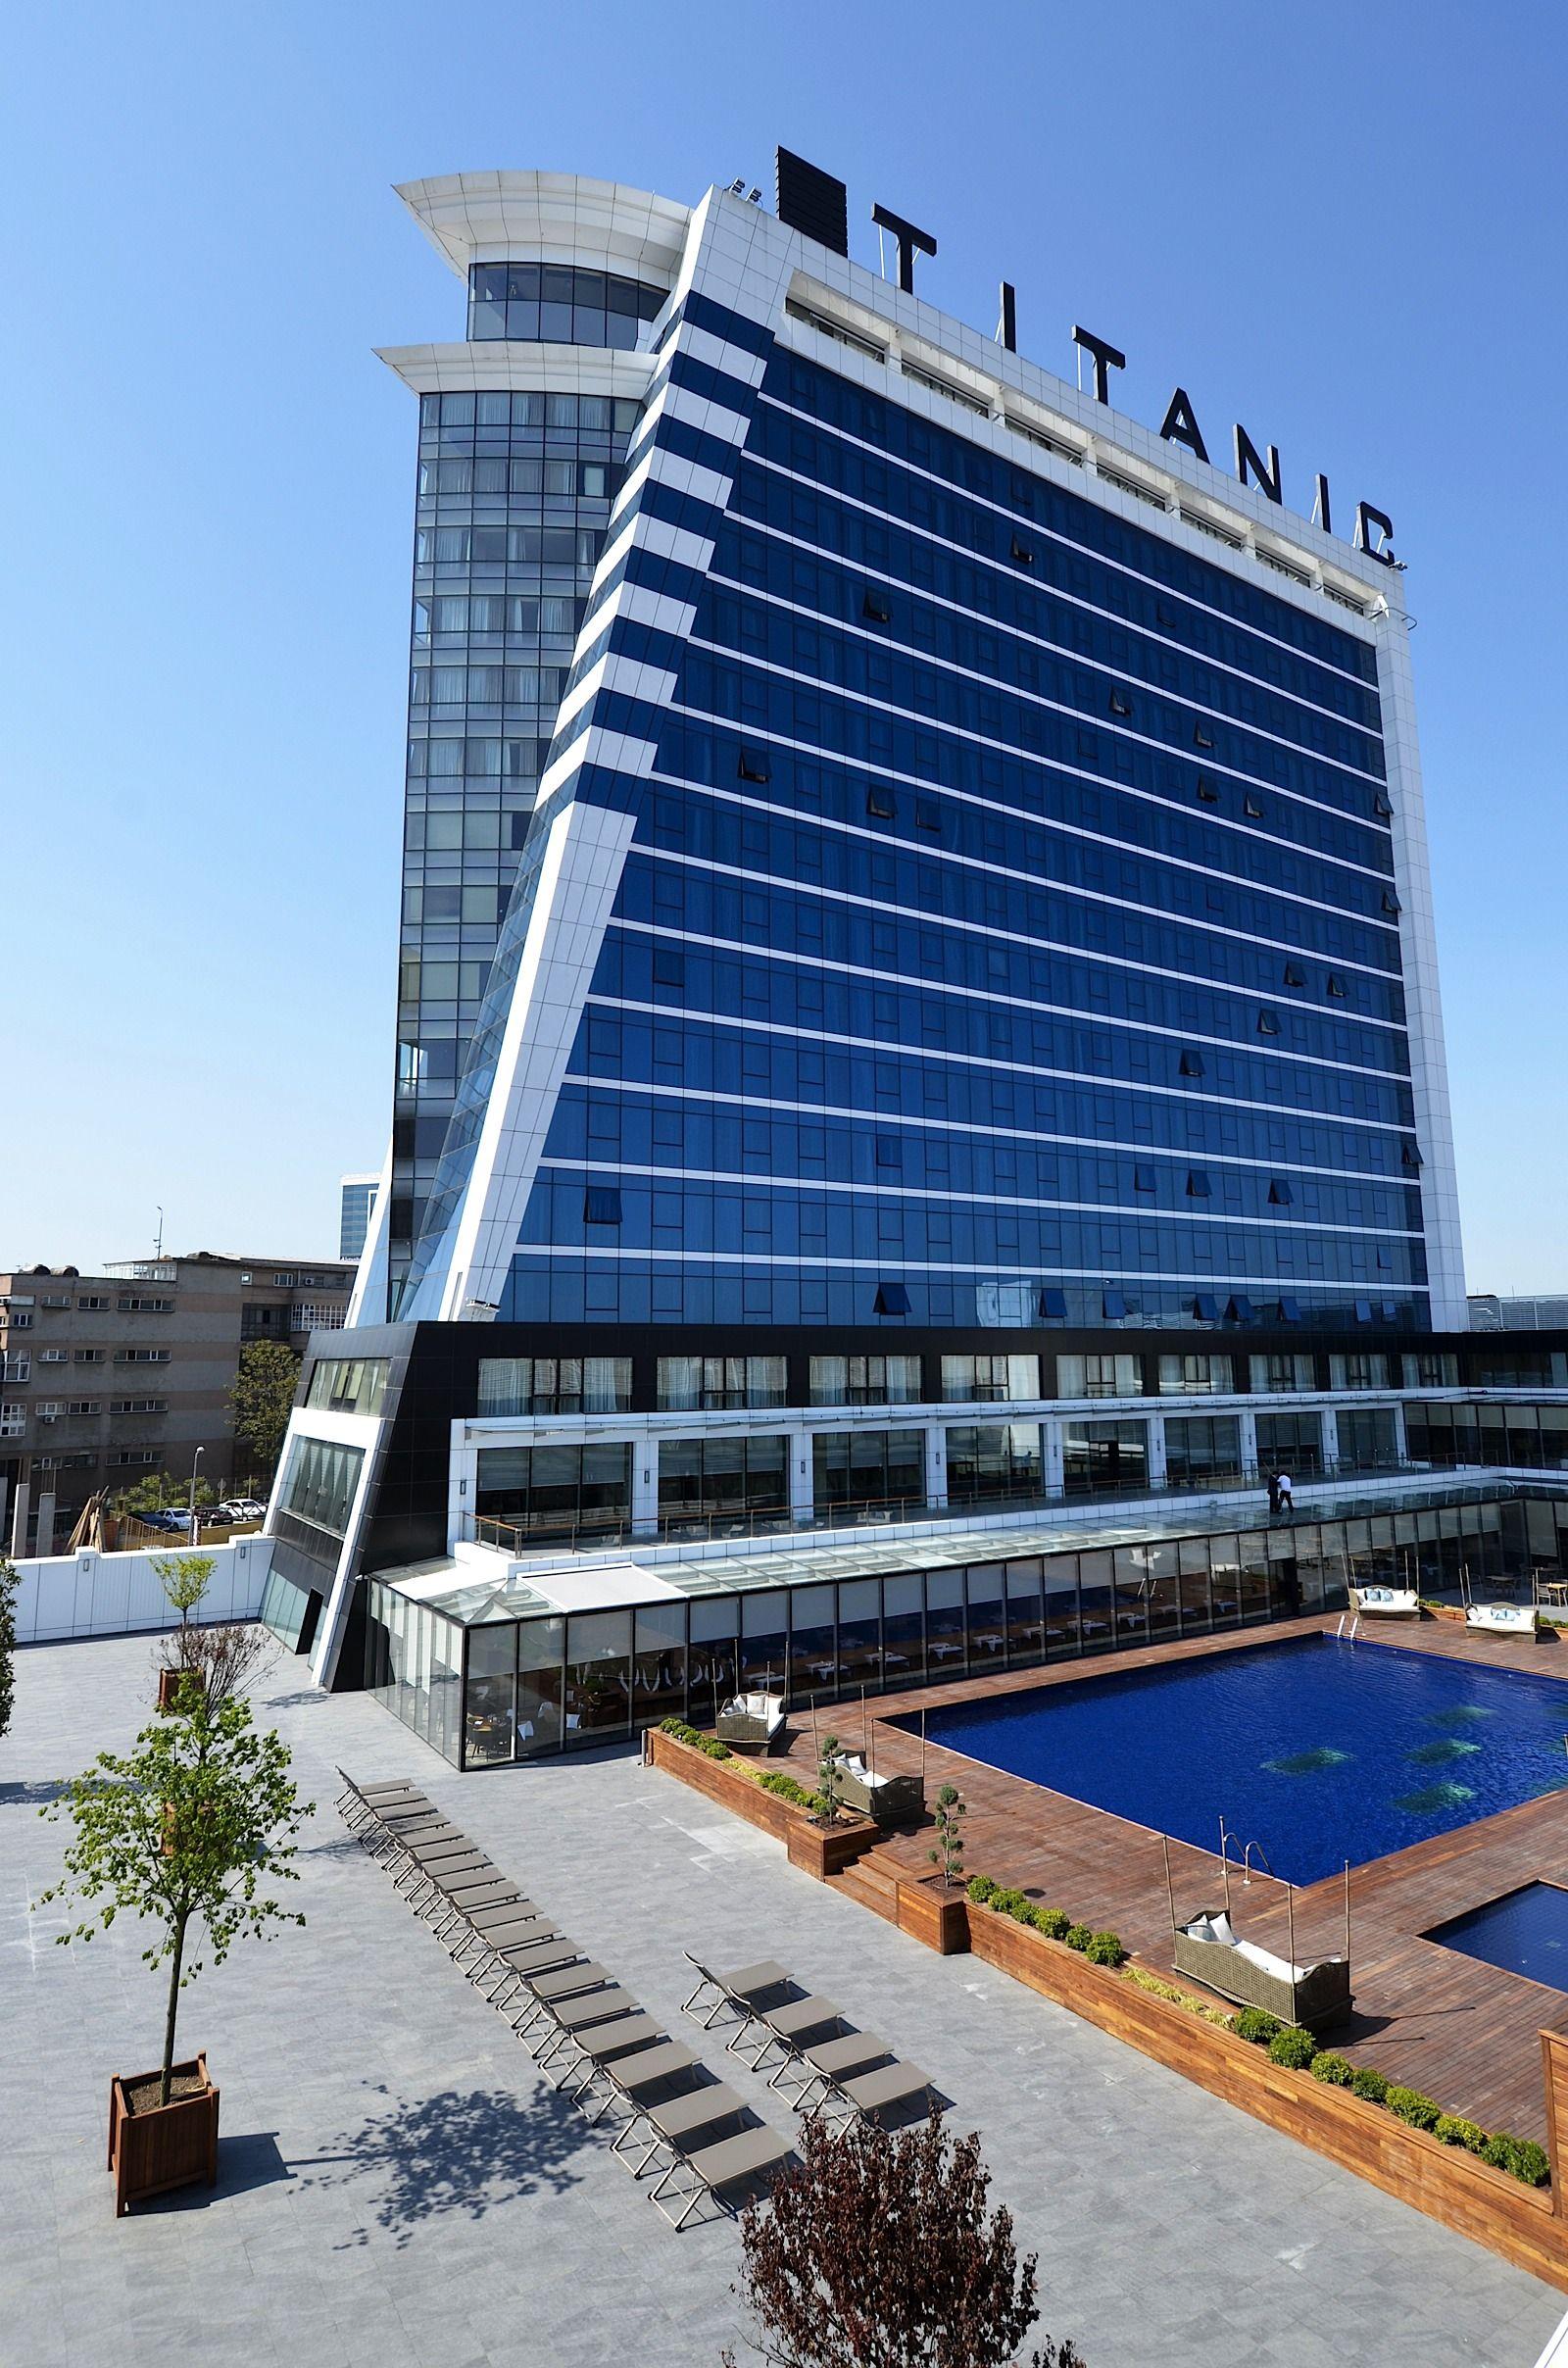 #titanic #hotels #business #bayrampasa #istanbul Titanic